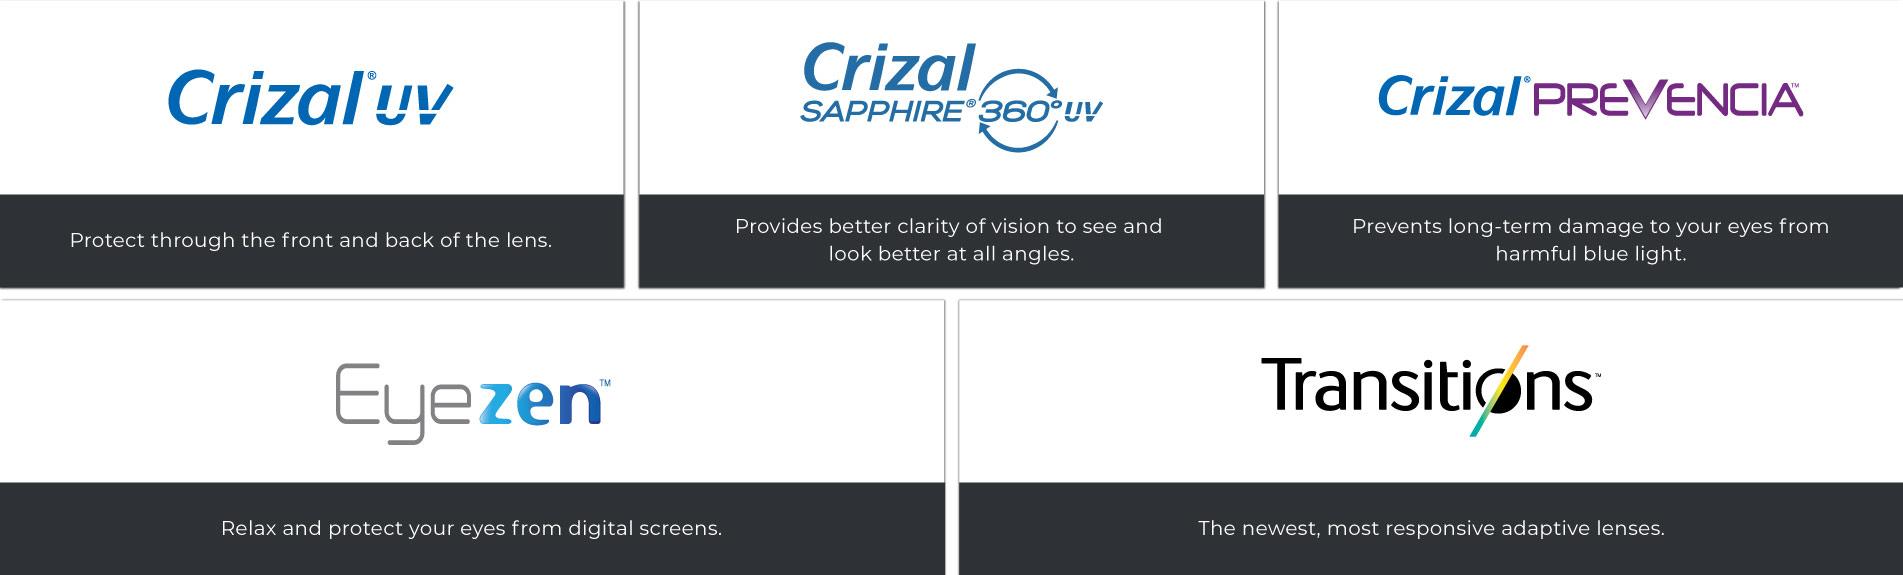 fc02b283265 Crizal expert essilor india jpg 1903x575 Who sells crizal lenses